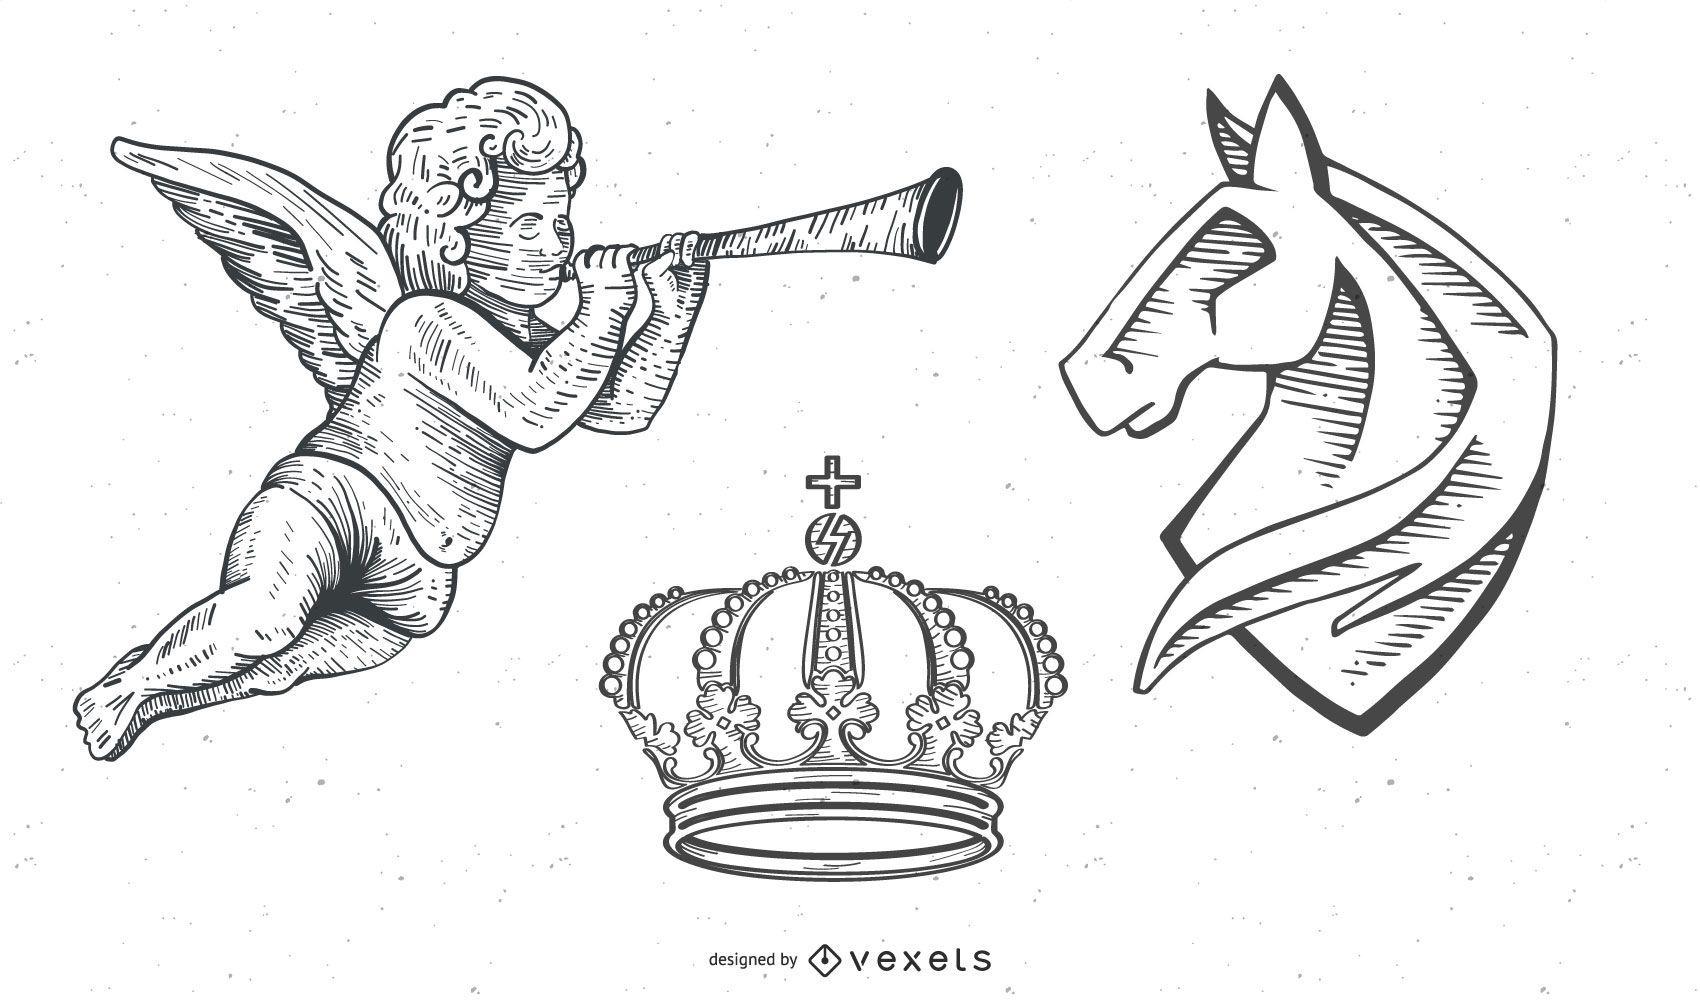 Vectores Vintage: Heráldica / ángeles / corona